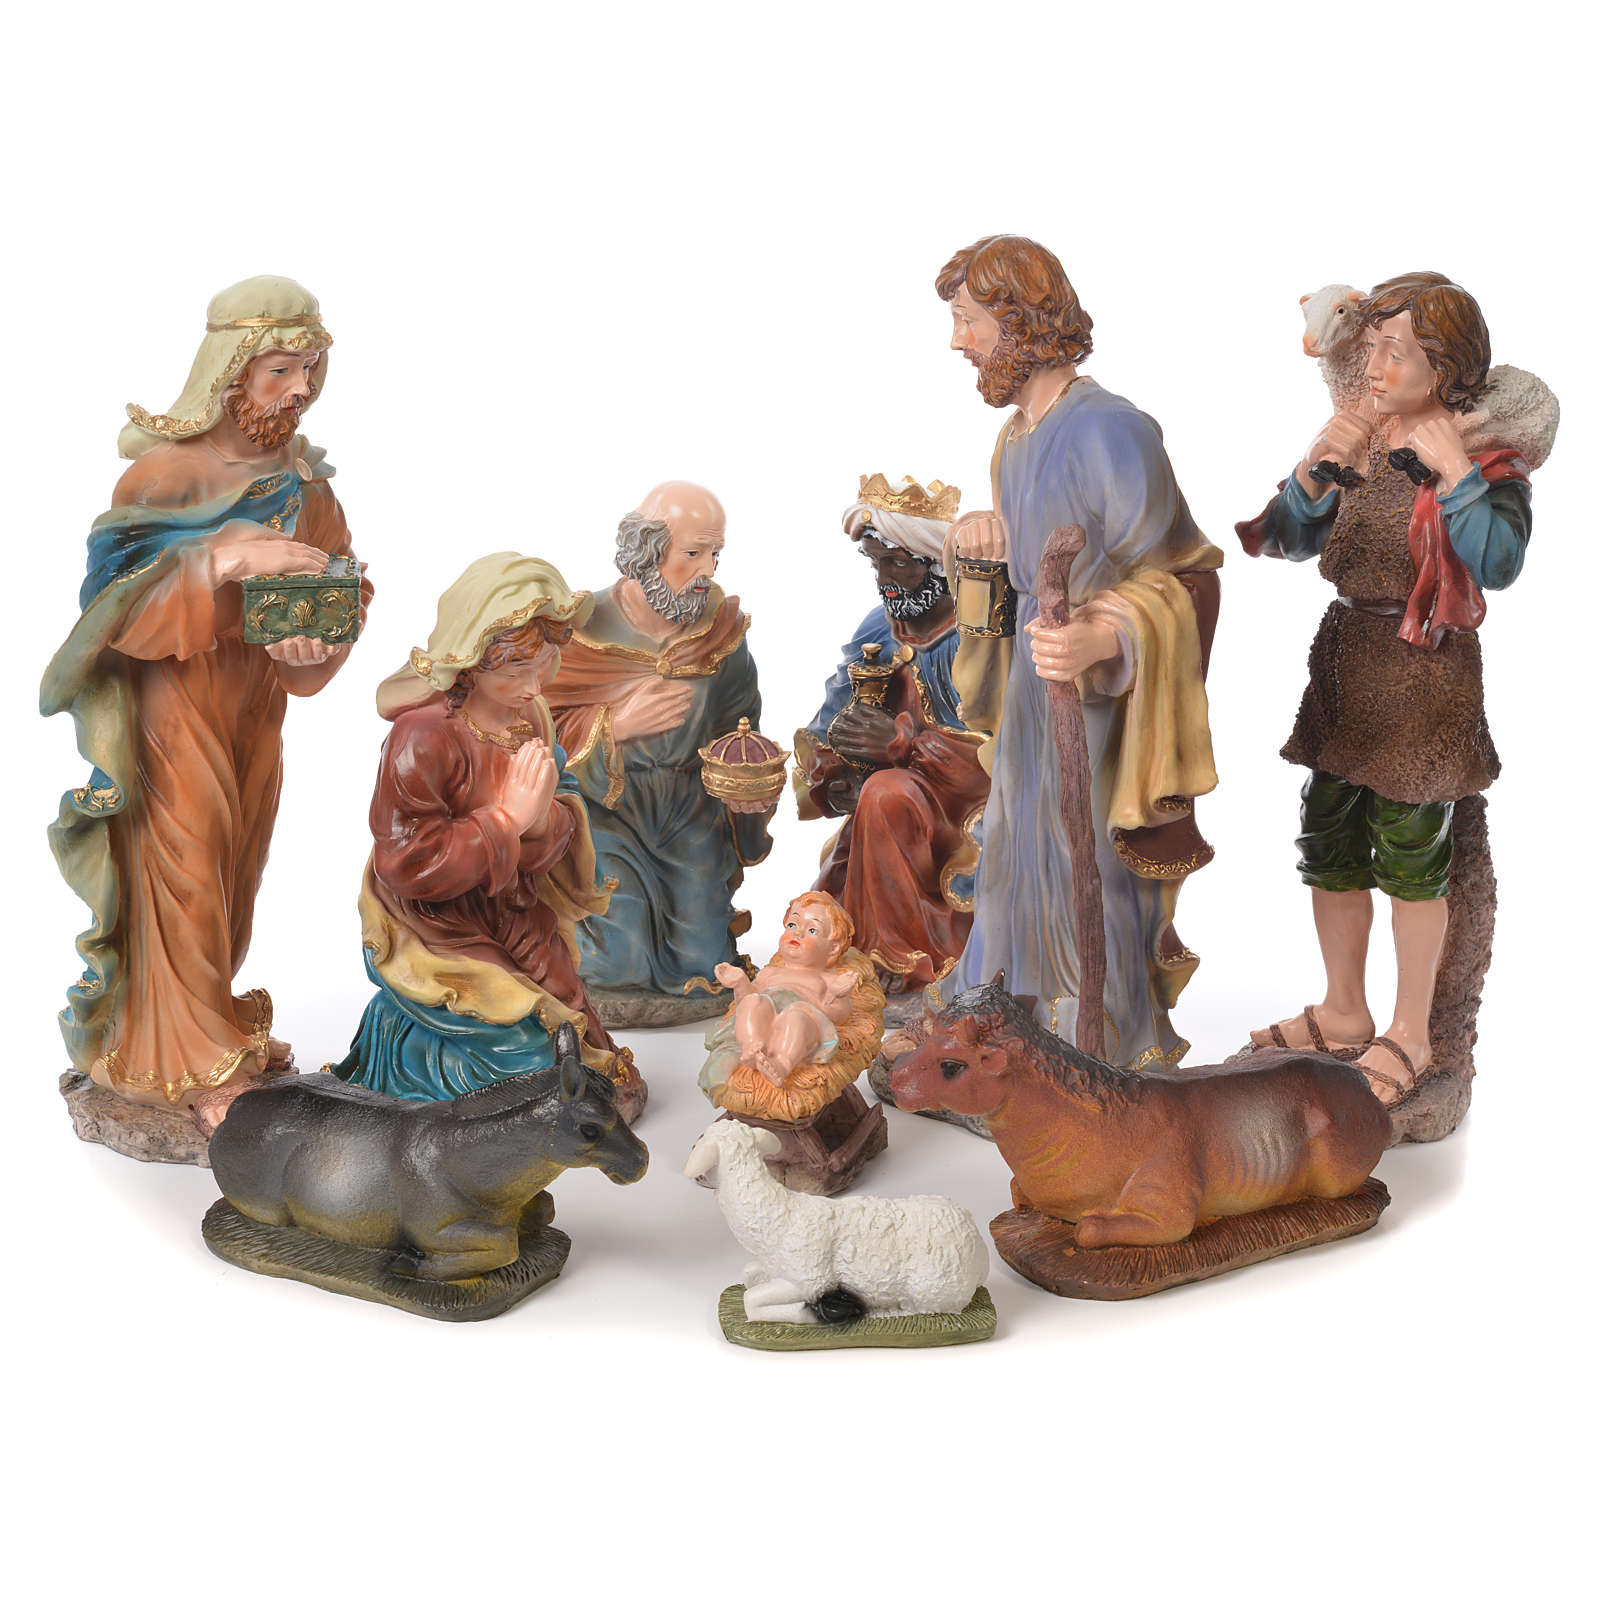 Nativity set in resin, 10 figurines measuring 44cm 4